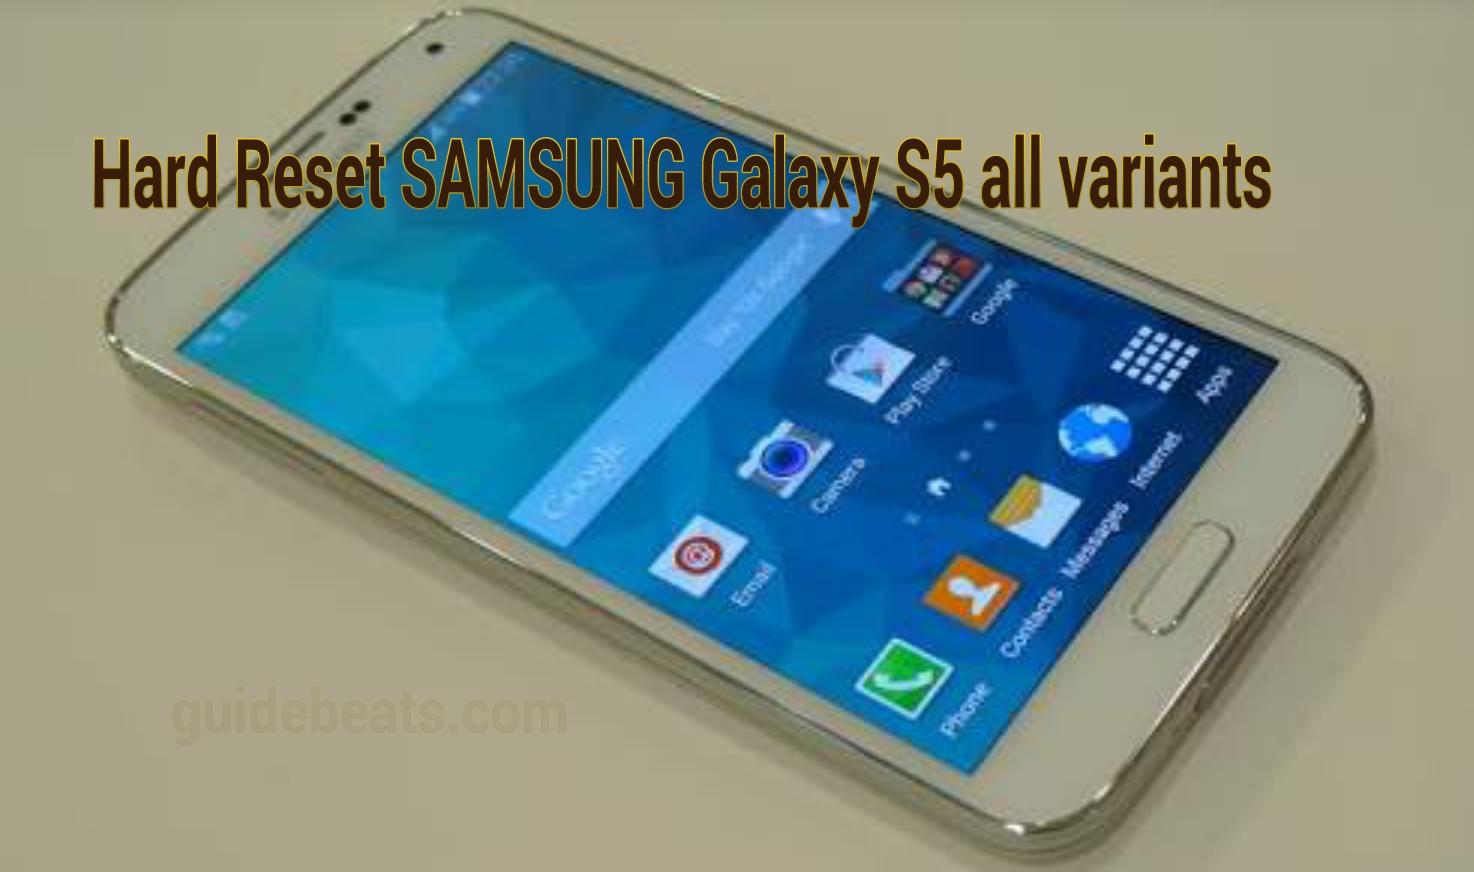 Hard Reset SAMSUNG Galaxy S5